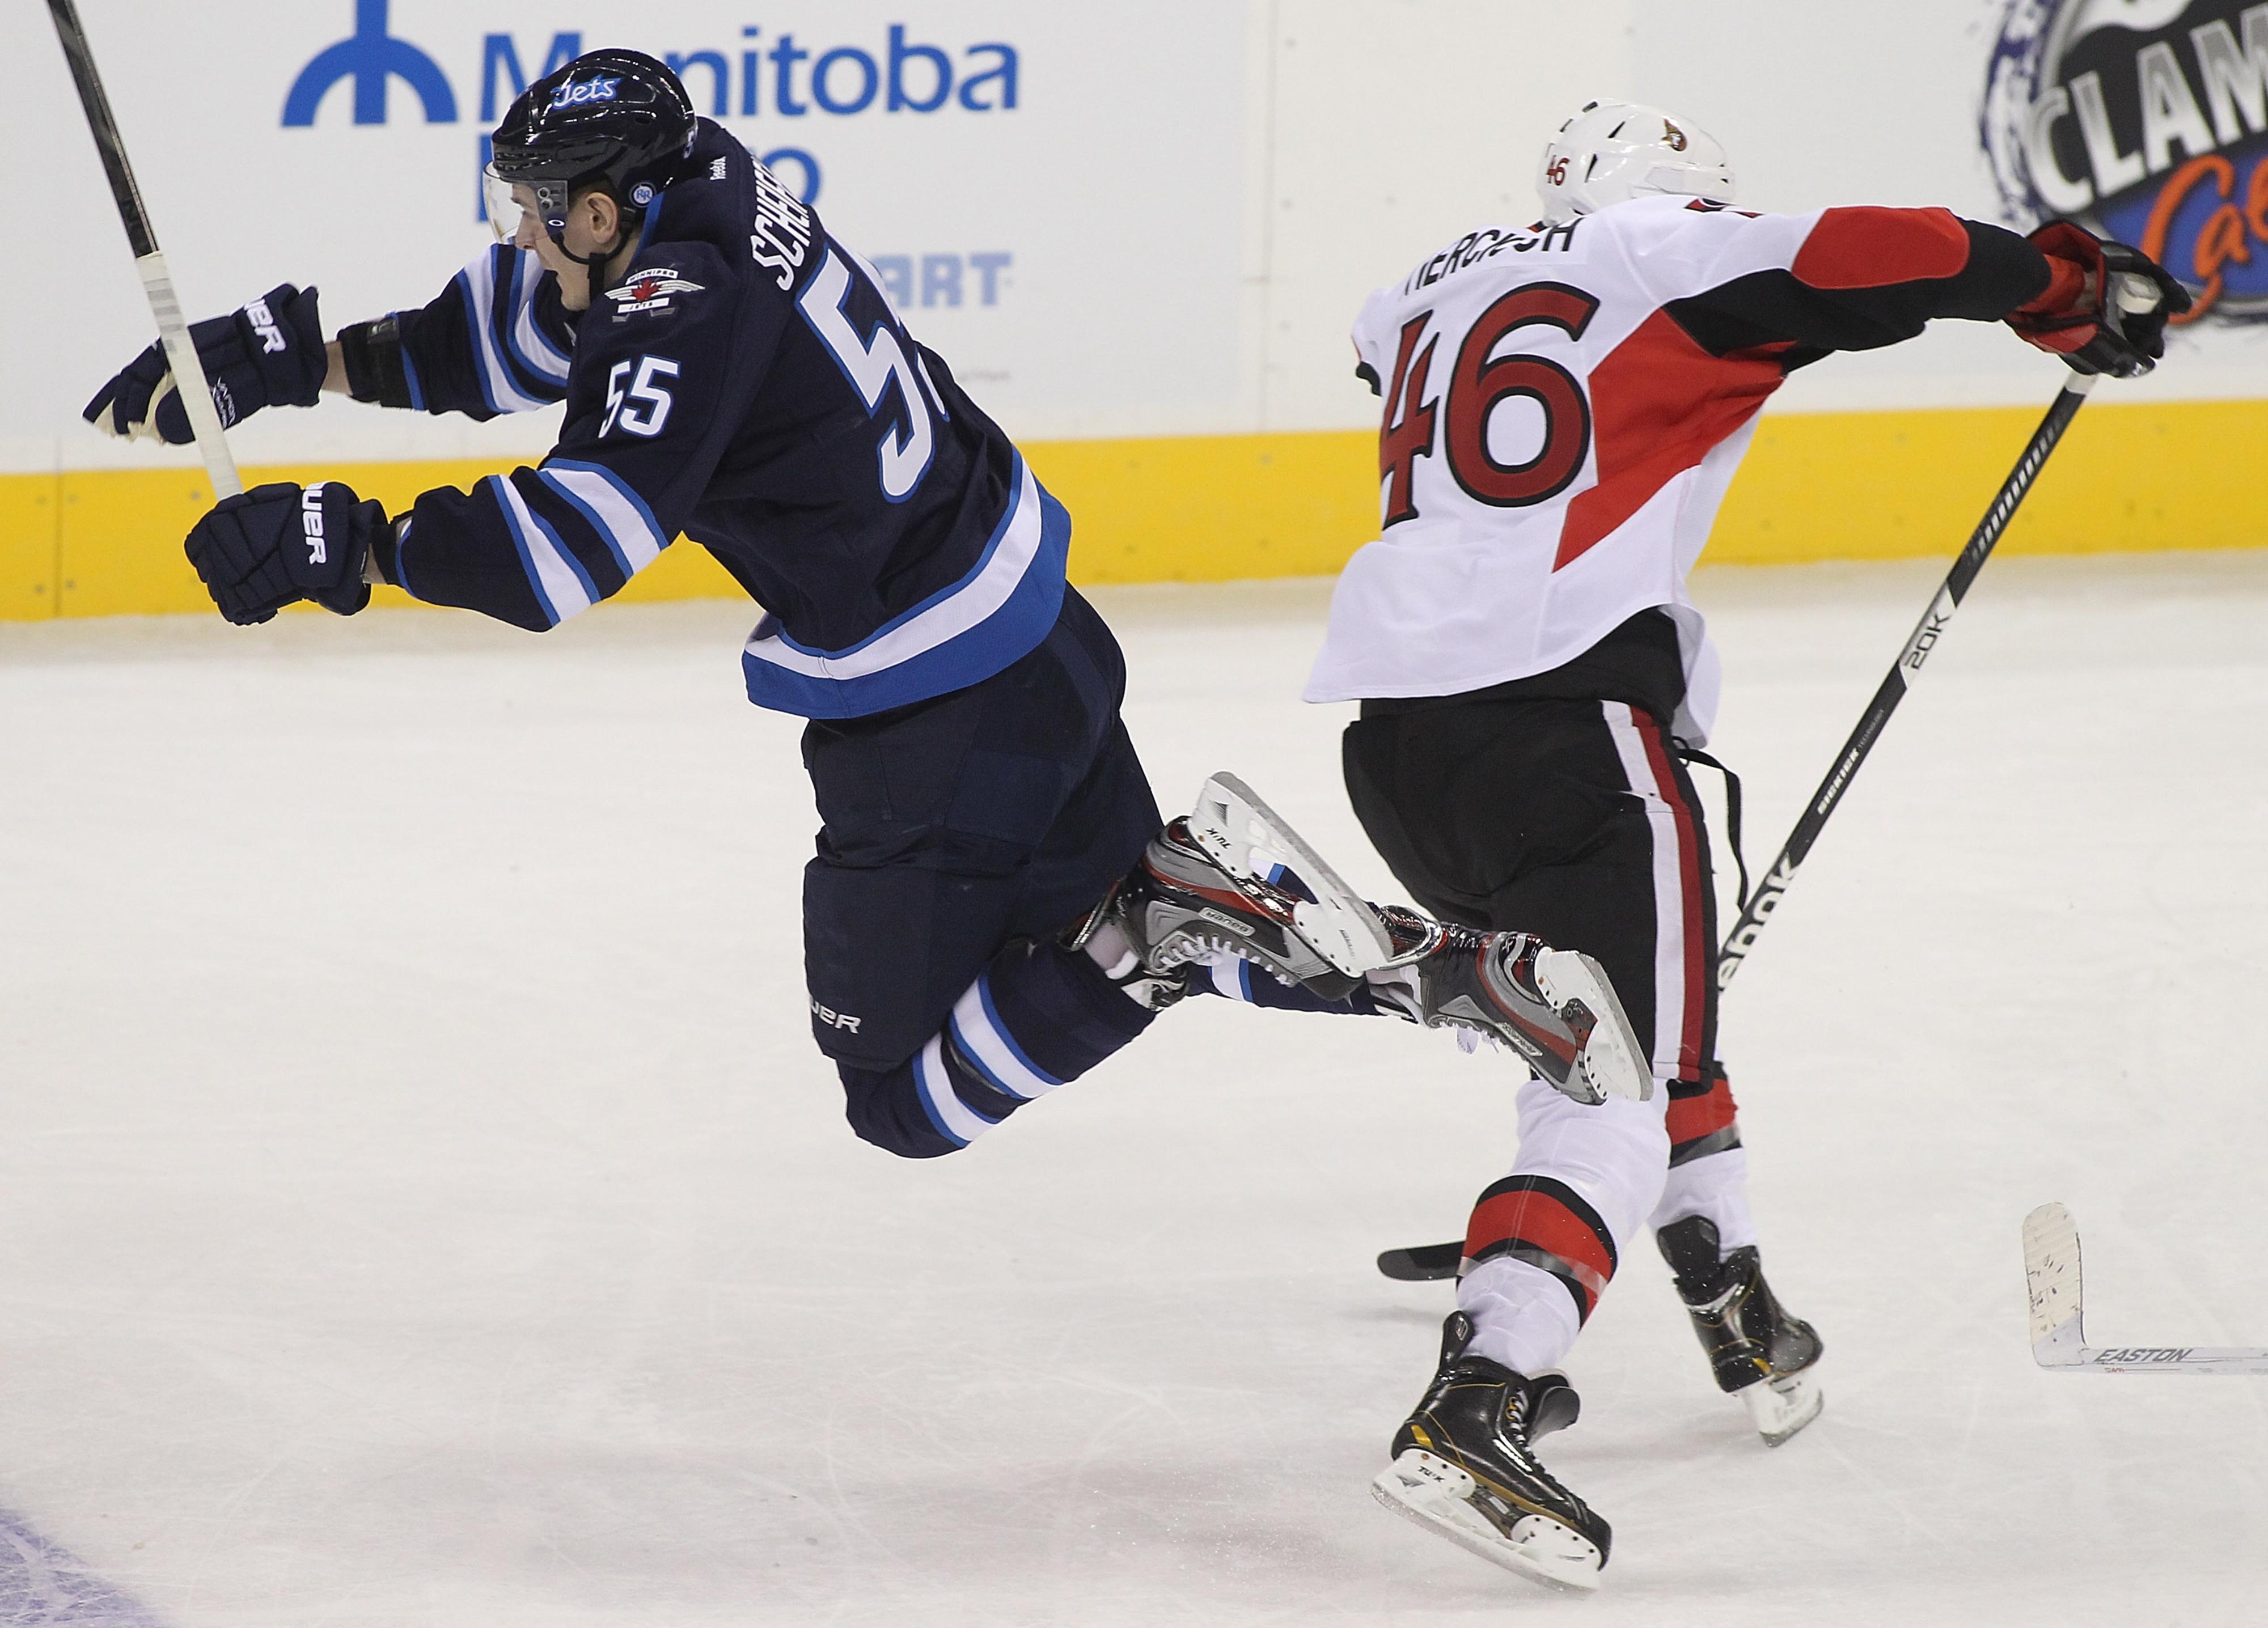 Patrick Wiercioch plays his own style of defense.